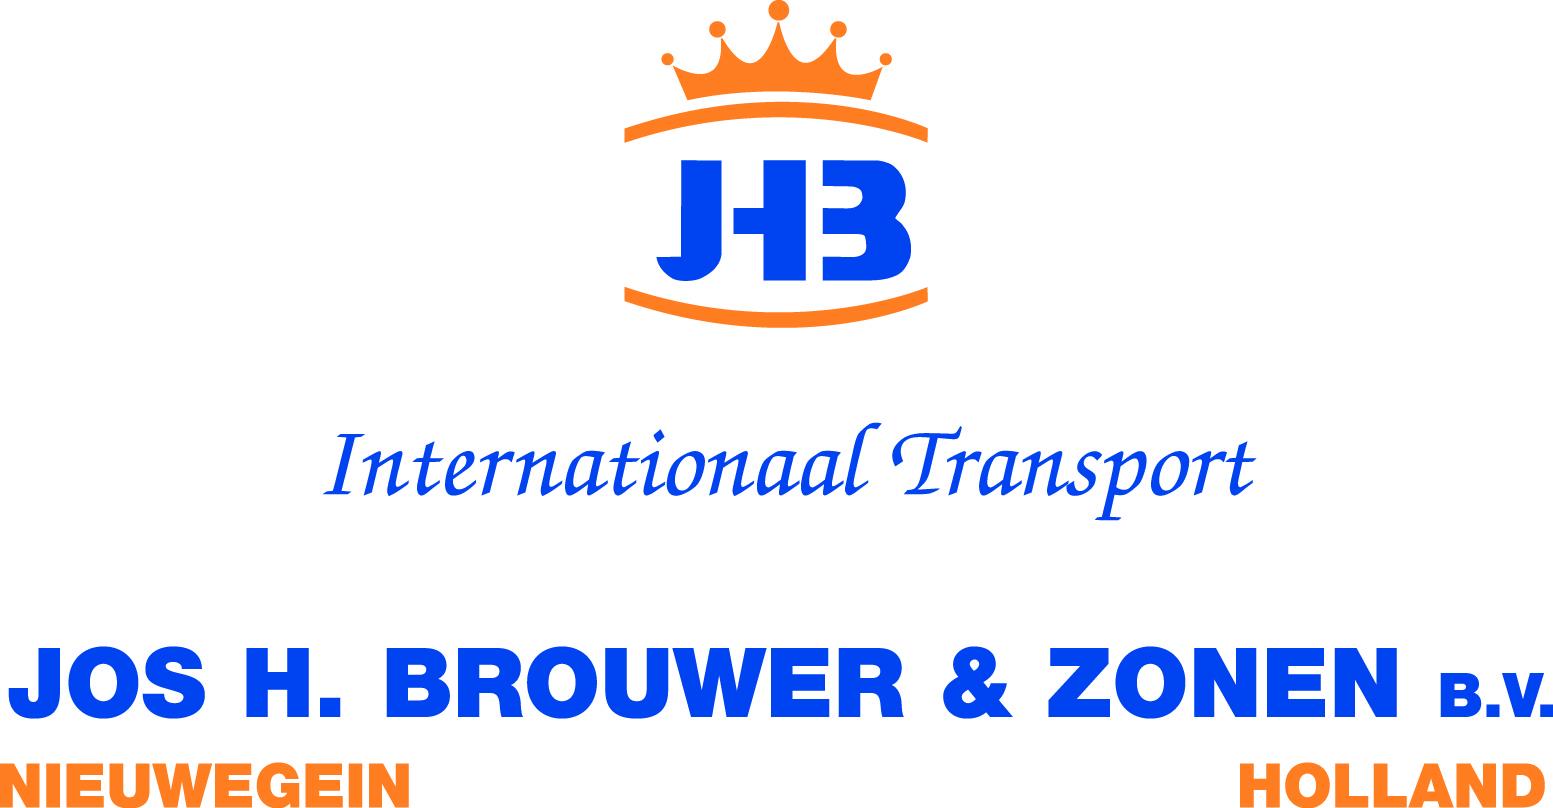 jhbrouwer transport